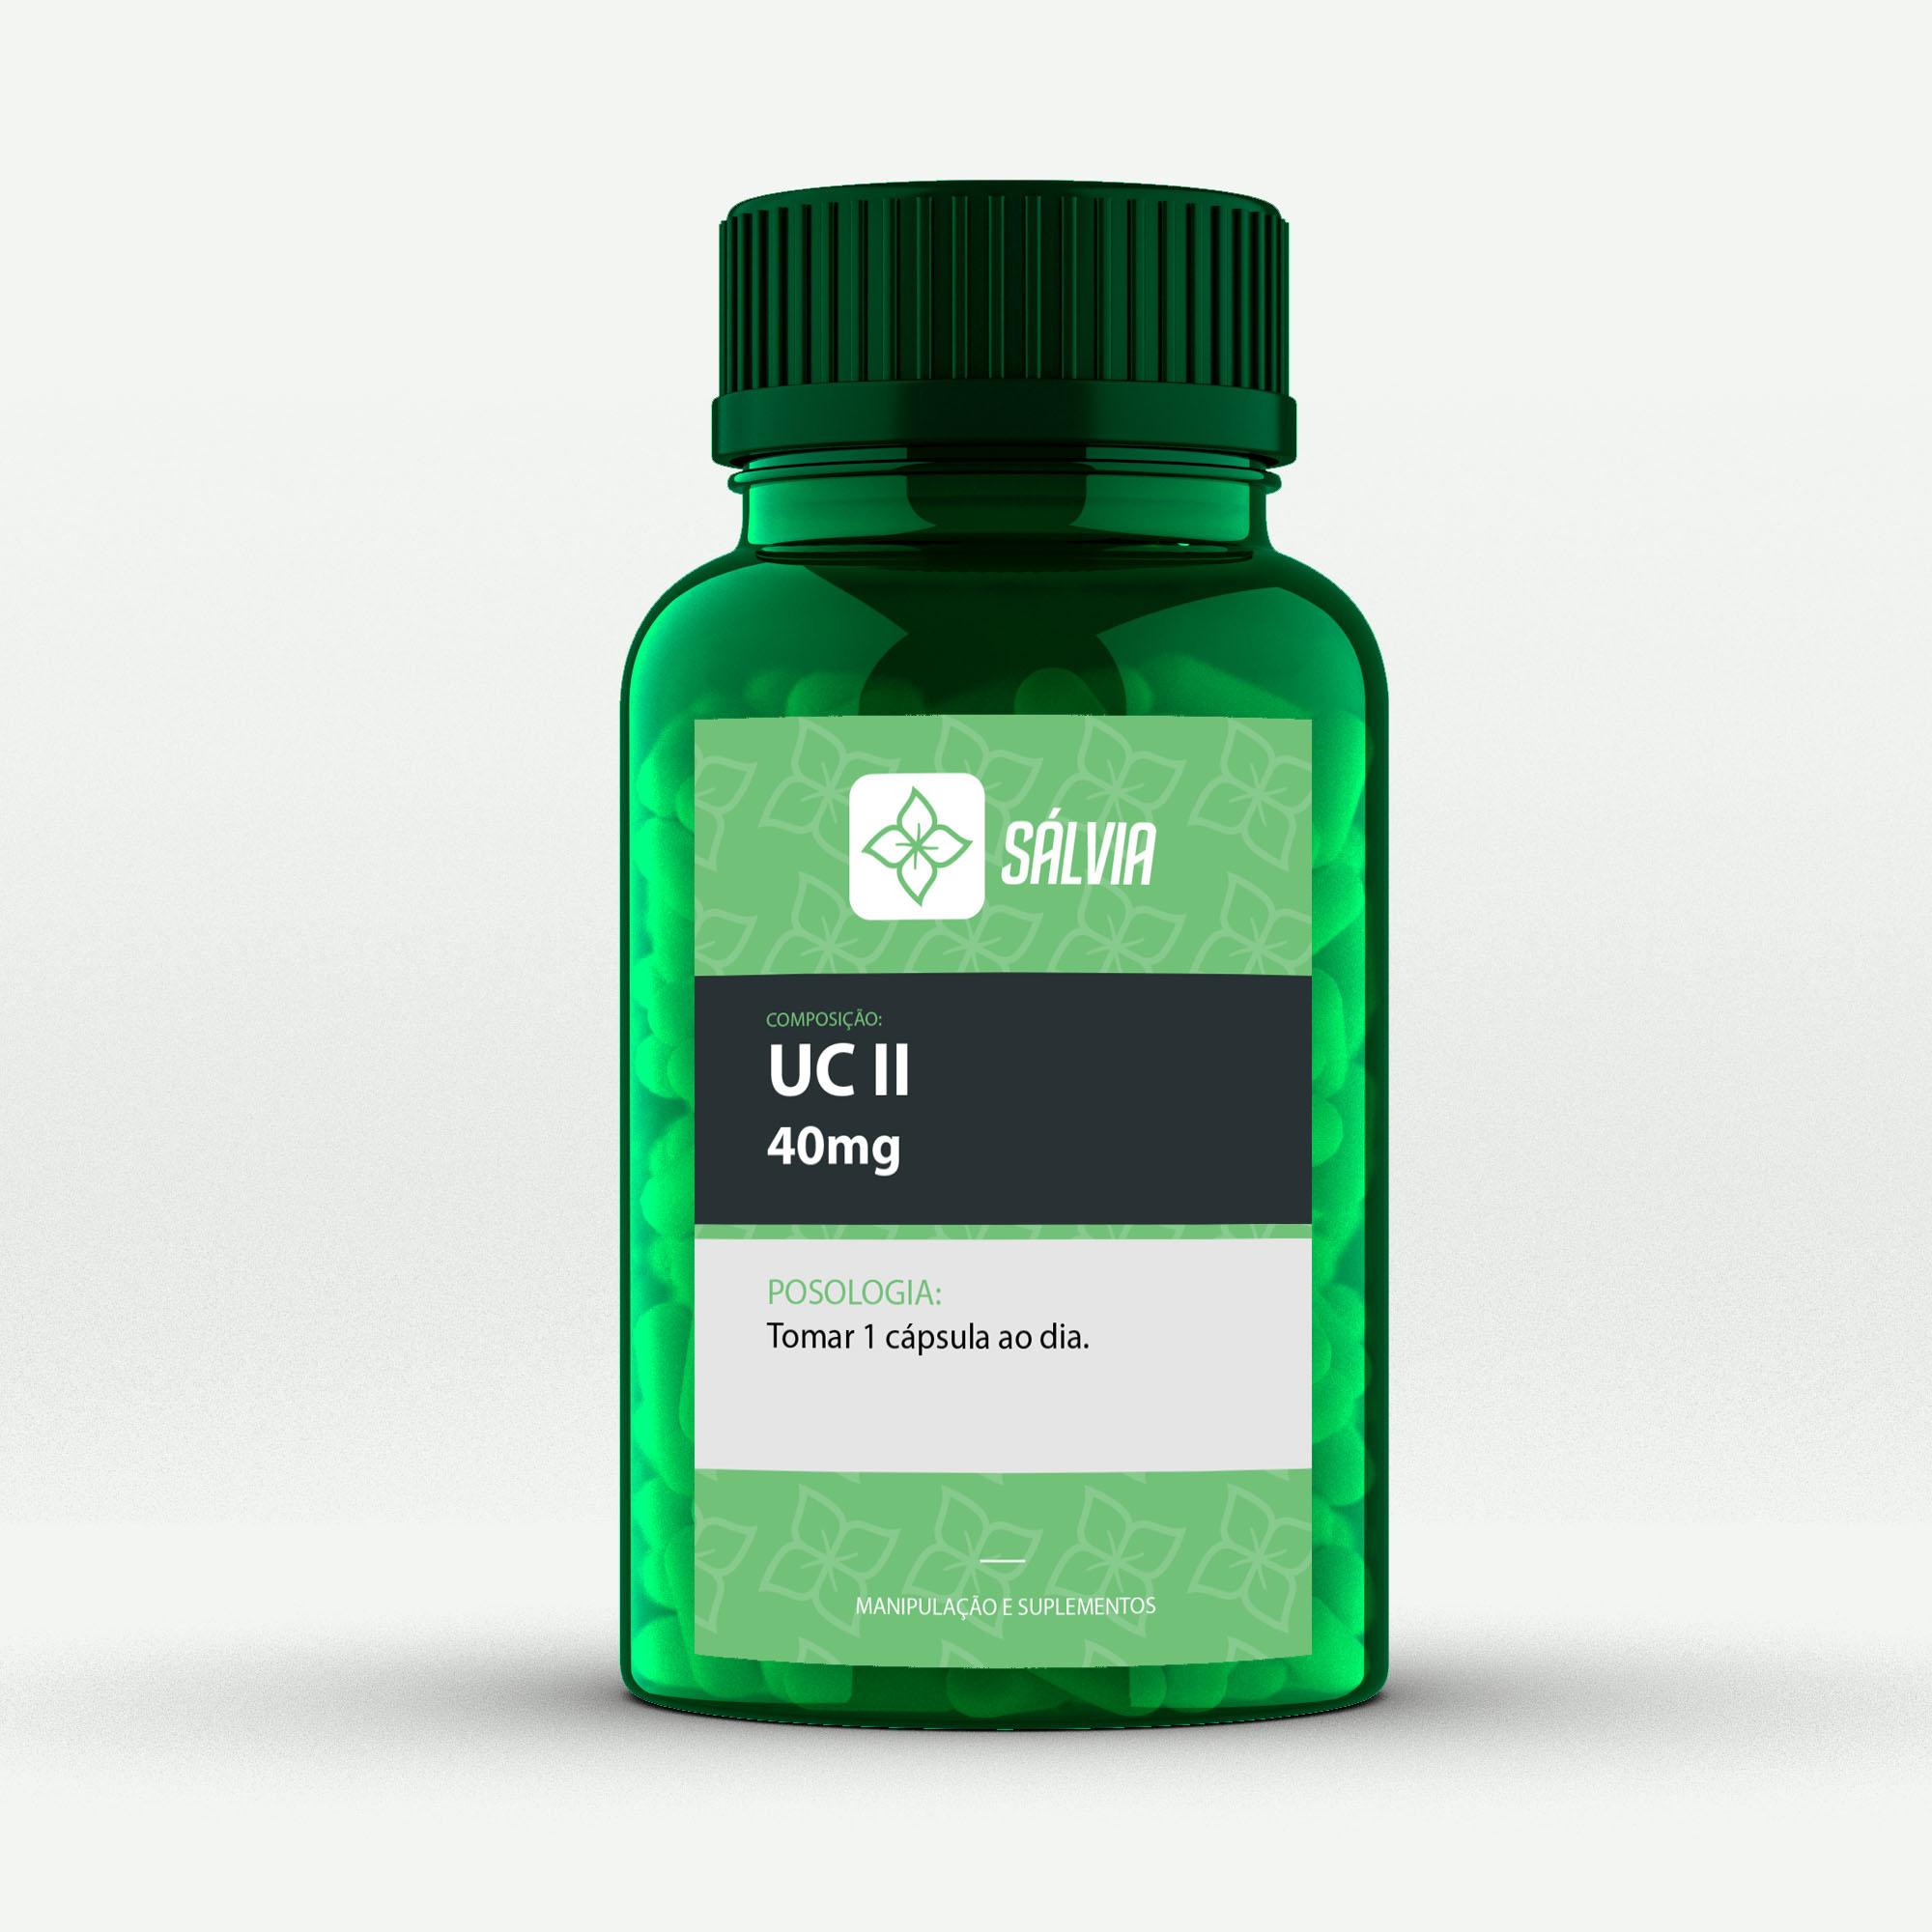 UC II 40mg - Cápsulas